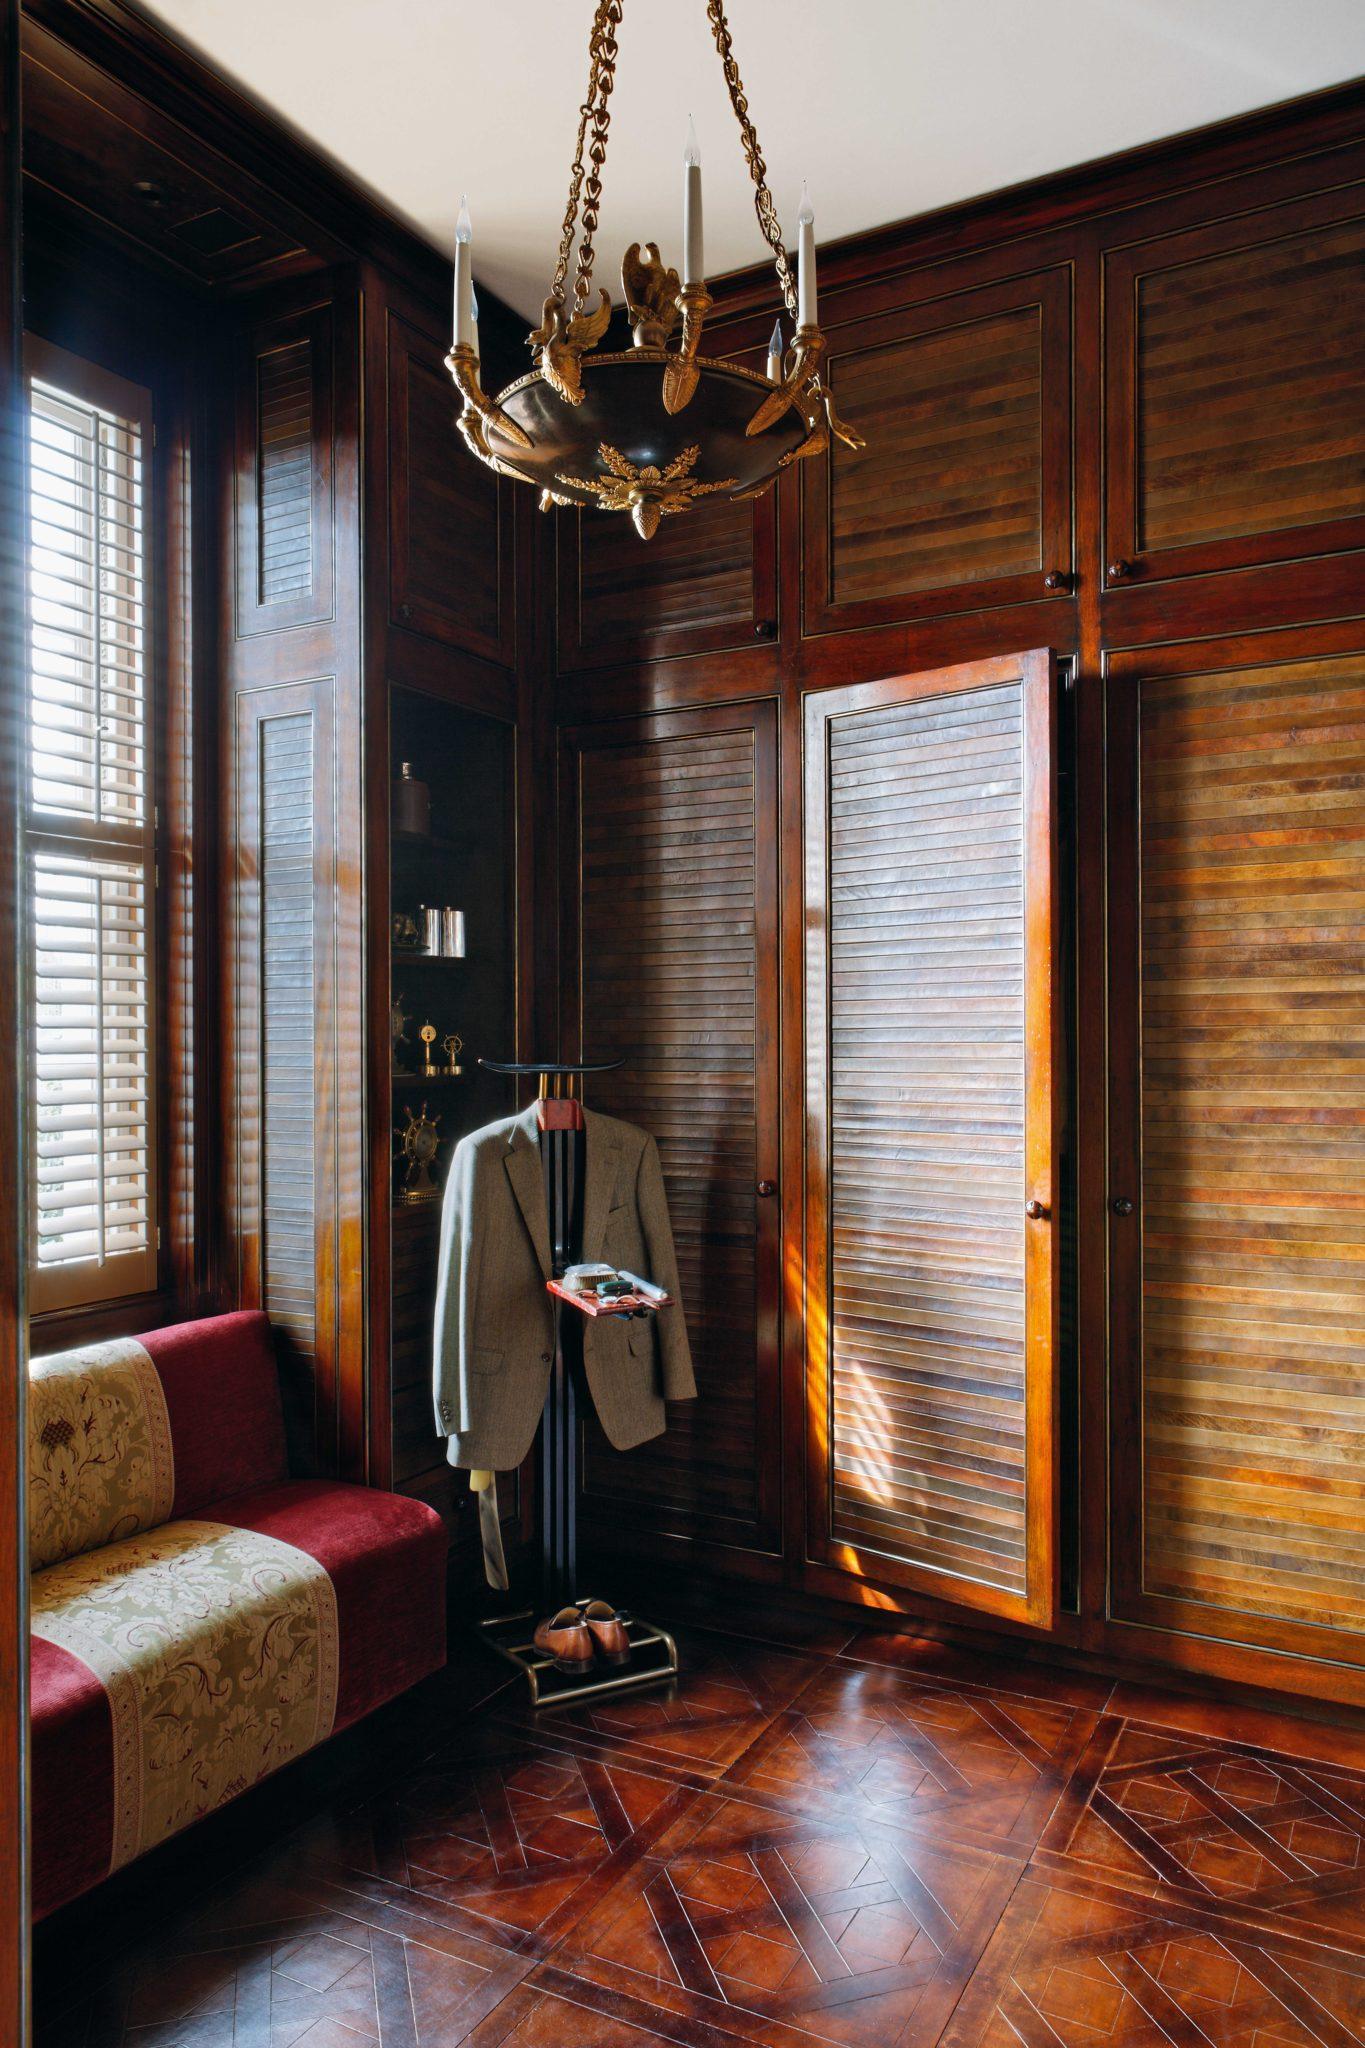 A Gentleman's Dressing Room in London by Alidad